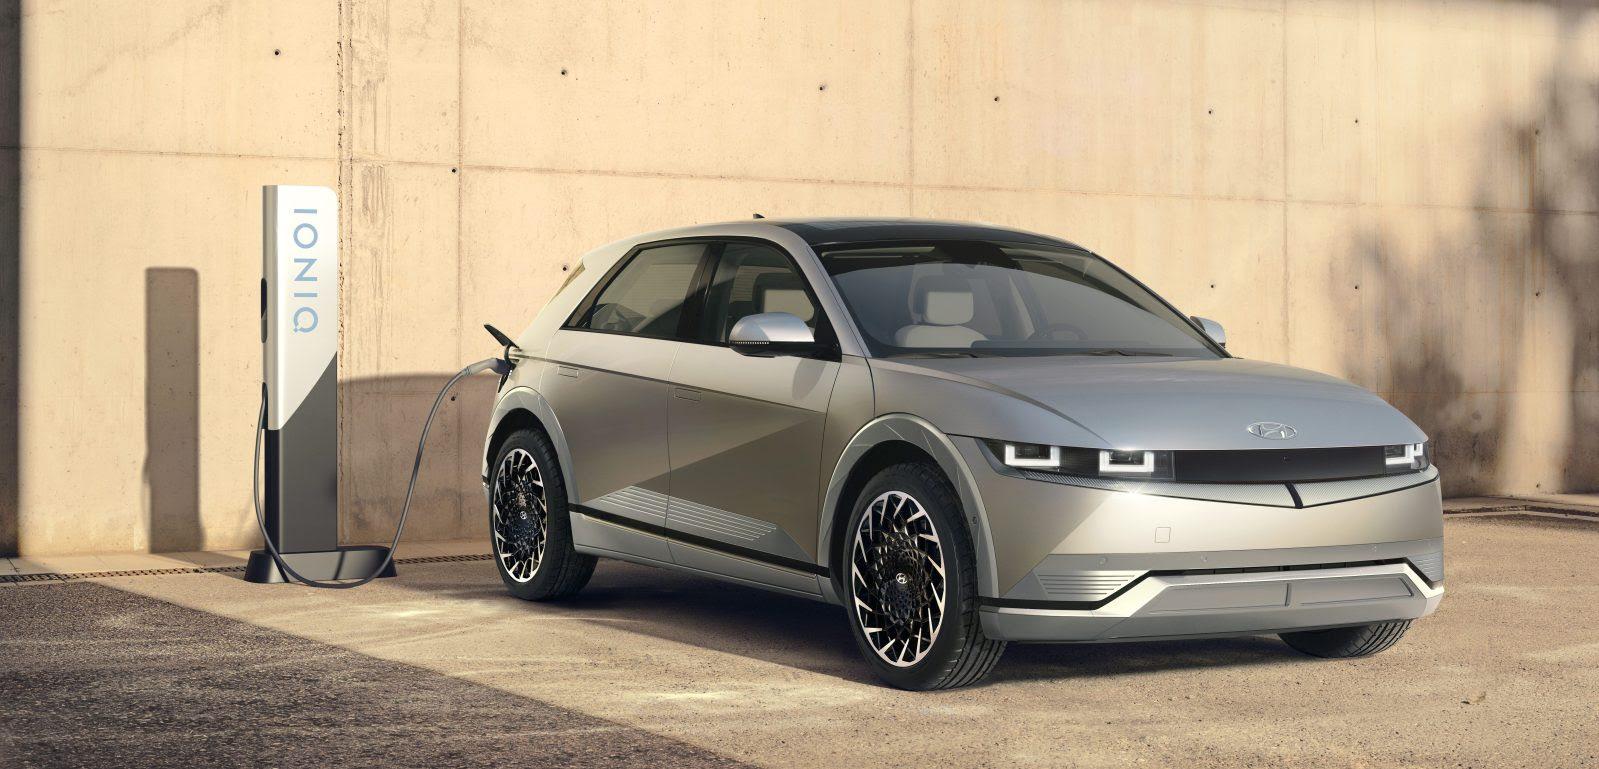 Hyundai delays Ioniq 5 electric car launch in the US